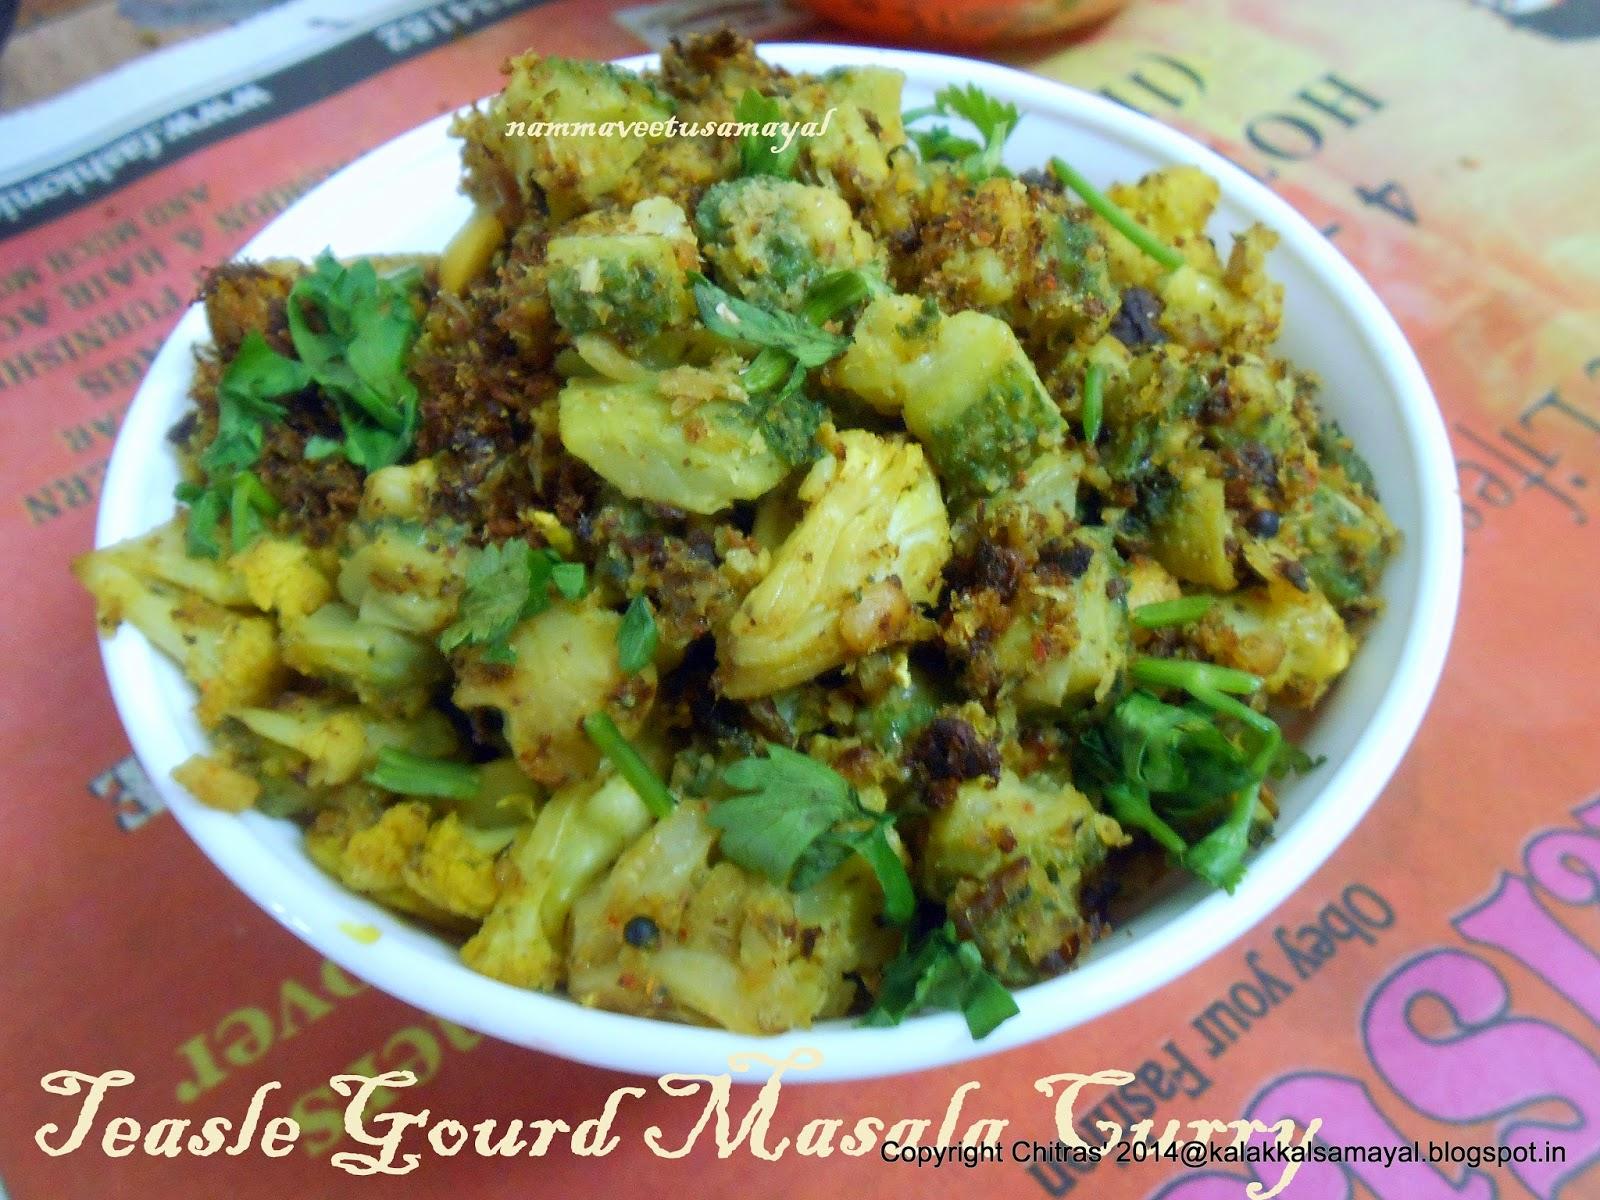 Teasle Gourd Masala Curry